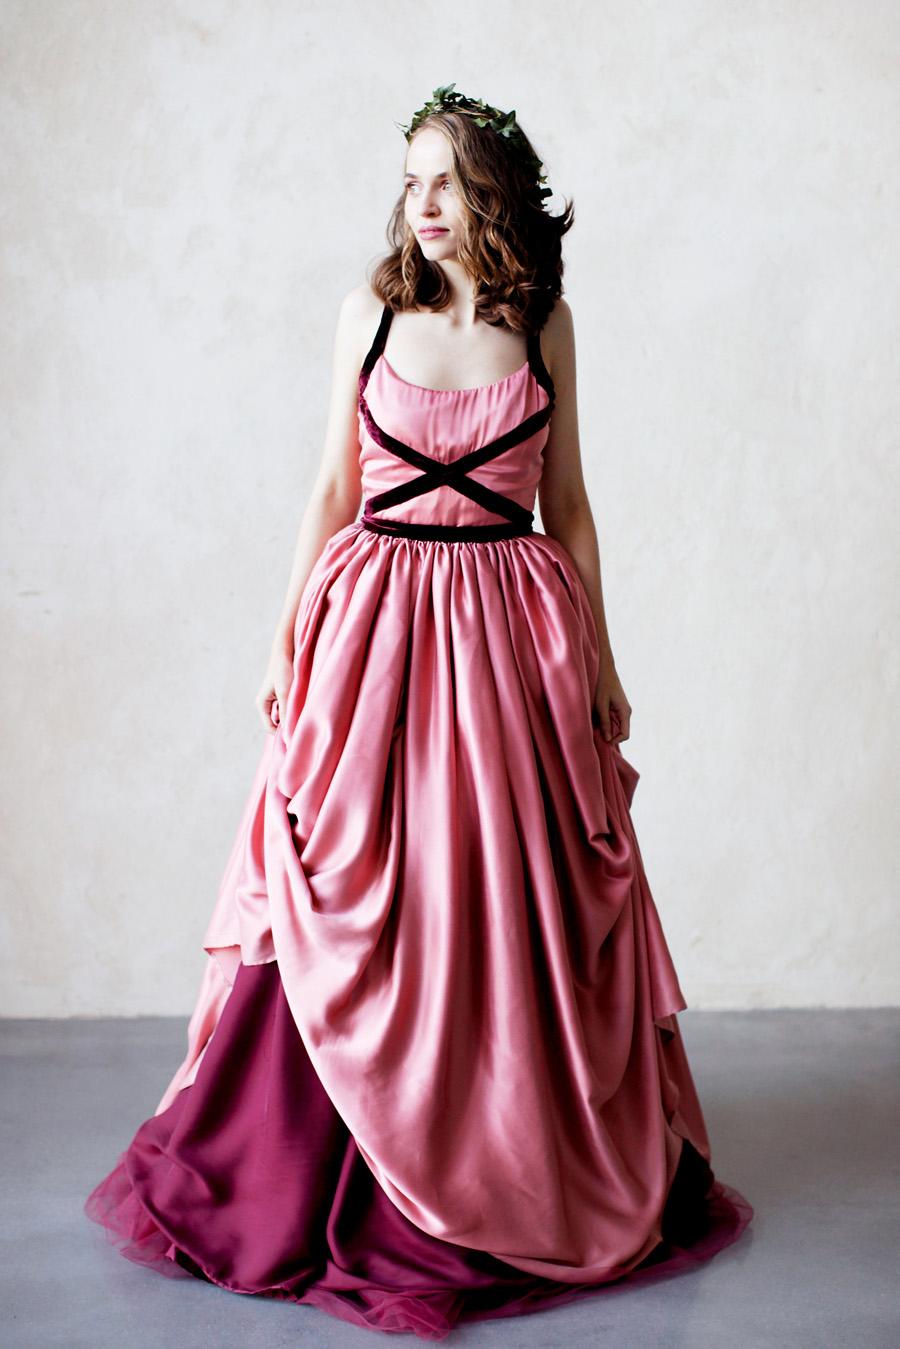 Ailsa Munro Dressmaker